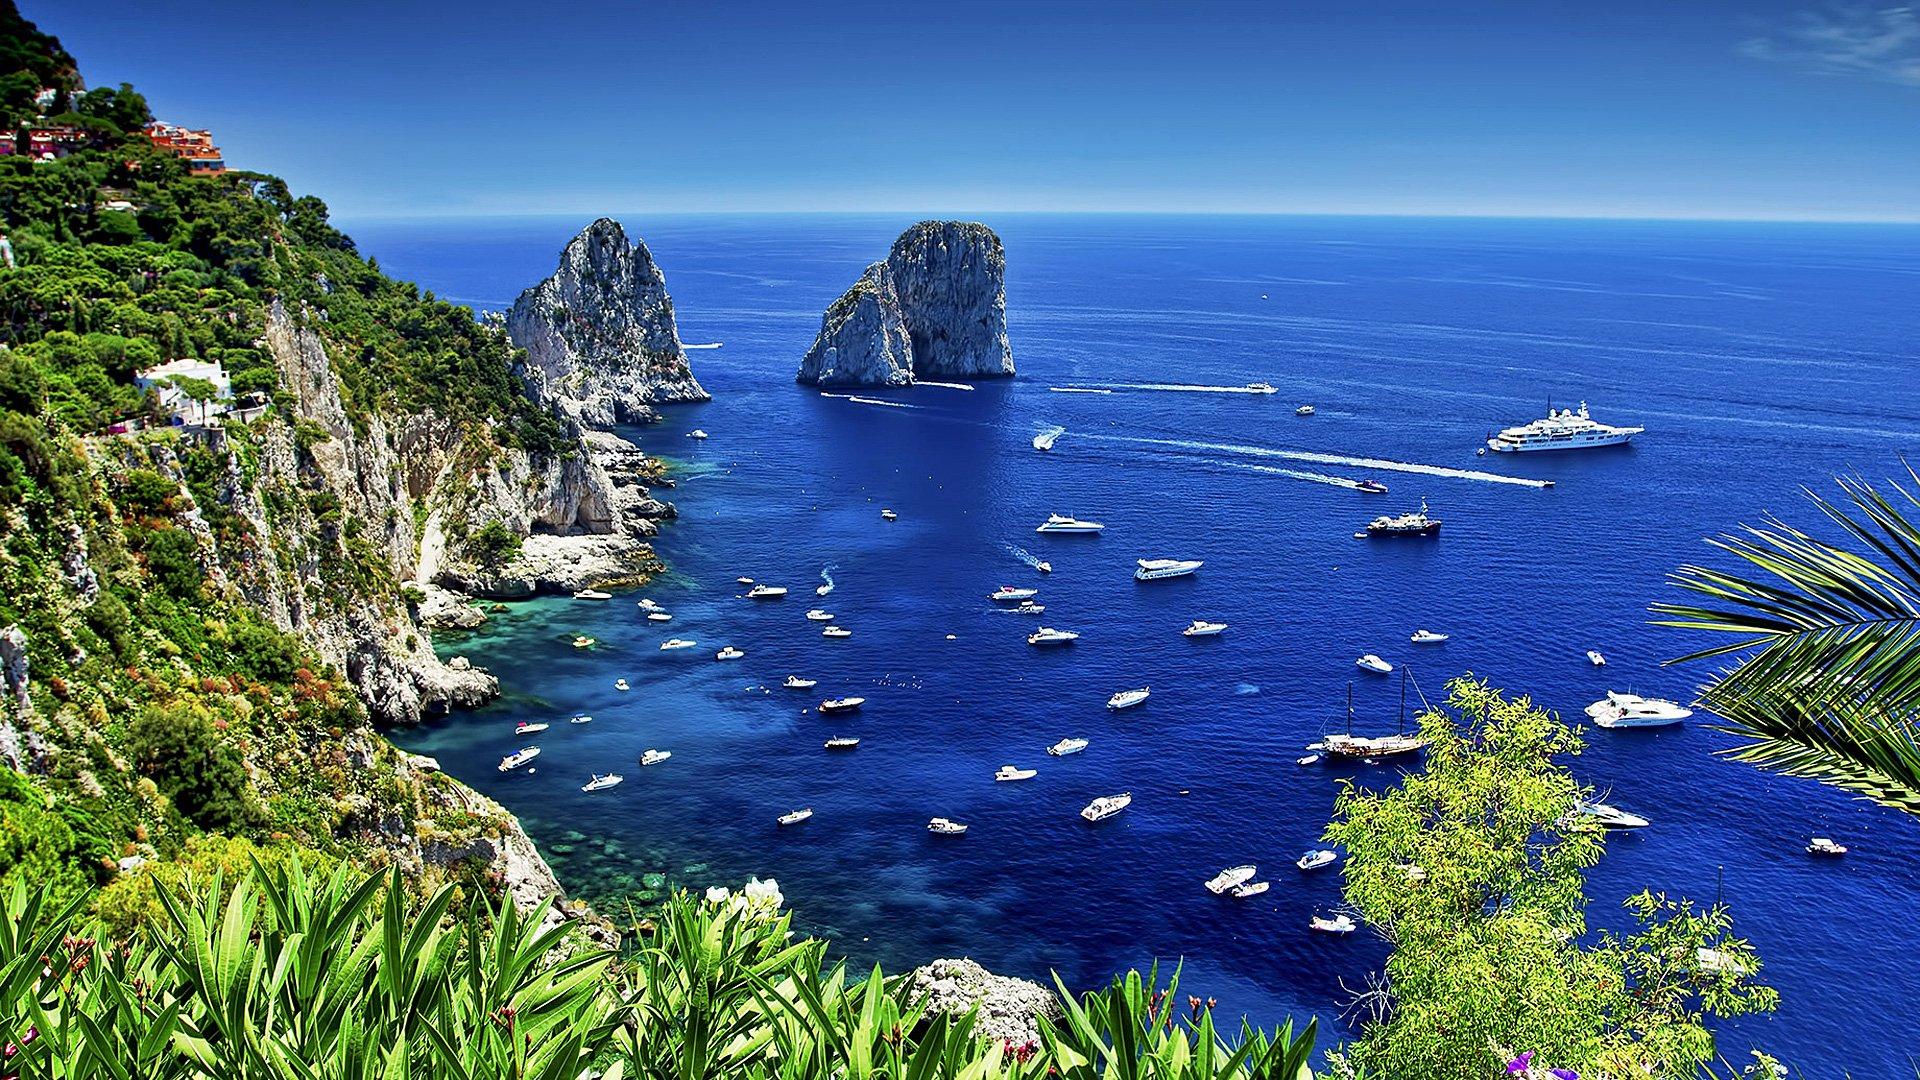 Capri Italy Hd Wallpaper Background Image 1920x1080 Id